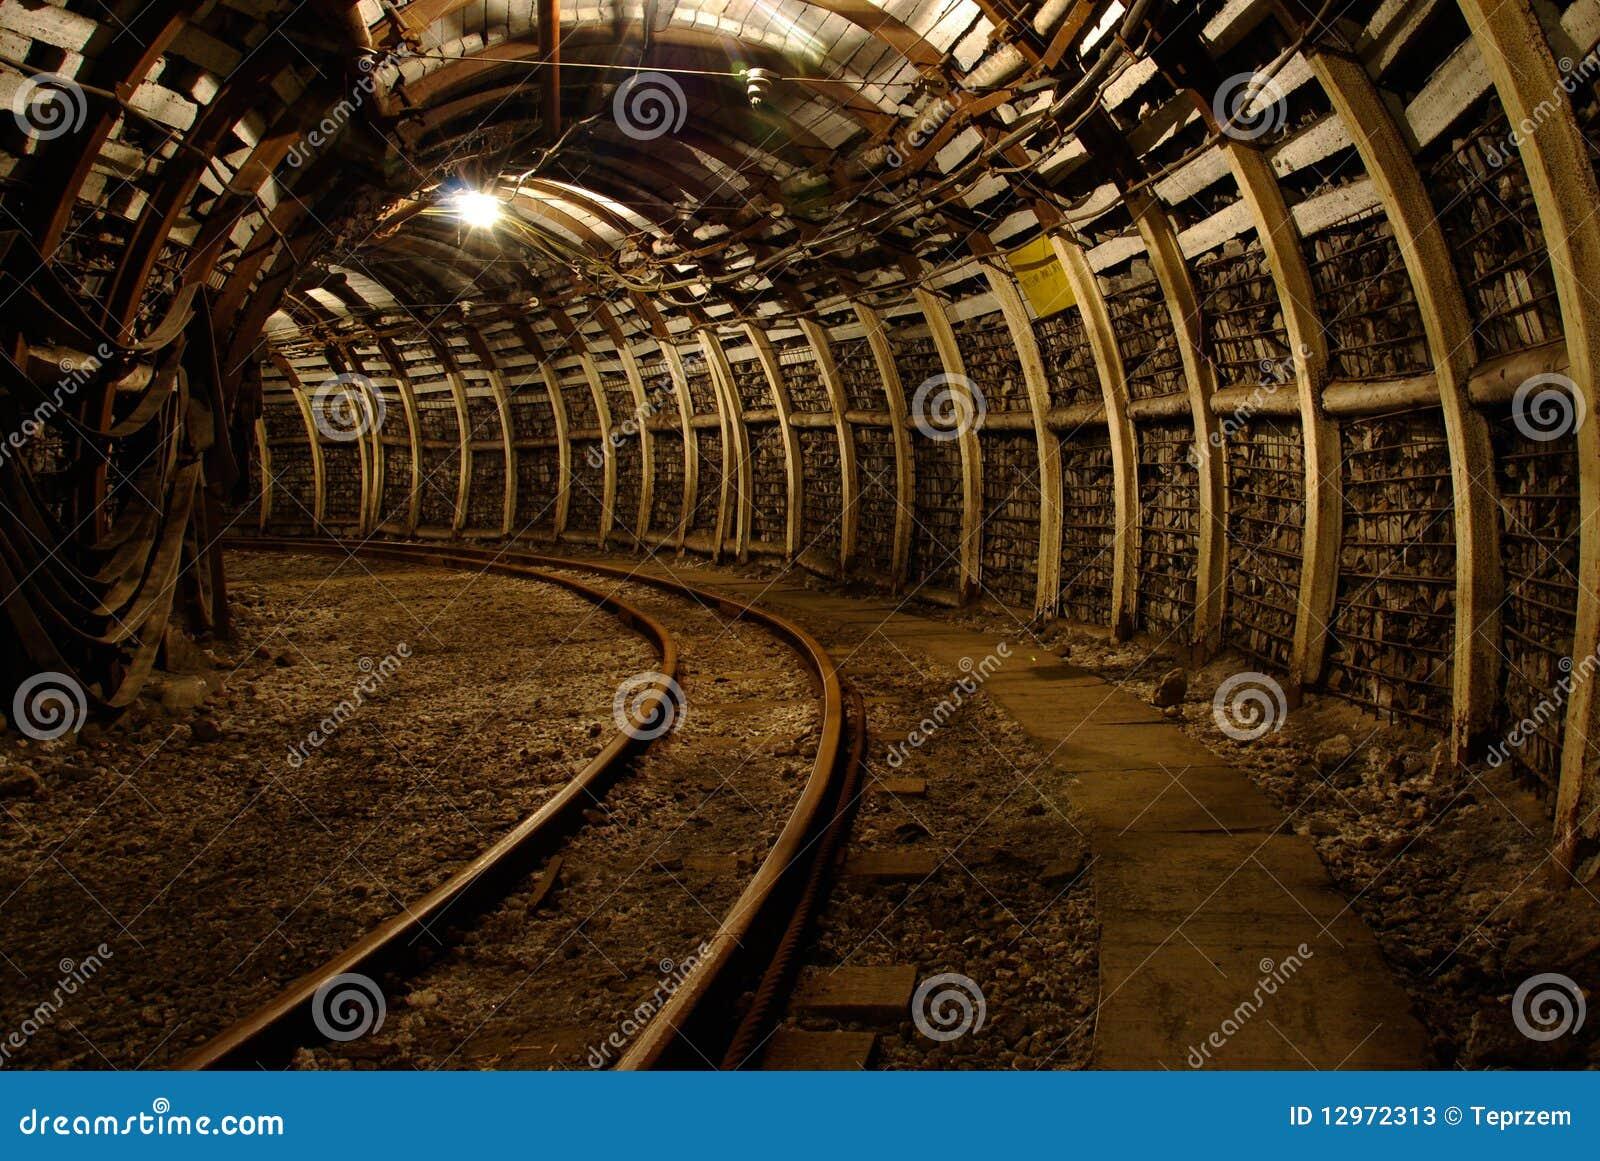 Modern Coal Mine Stock Photos - Image: 12972313